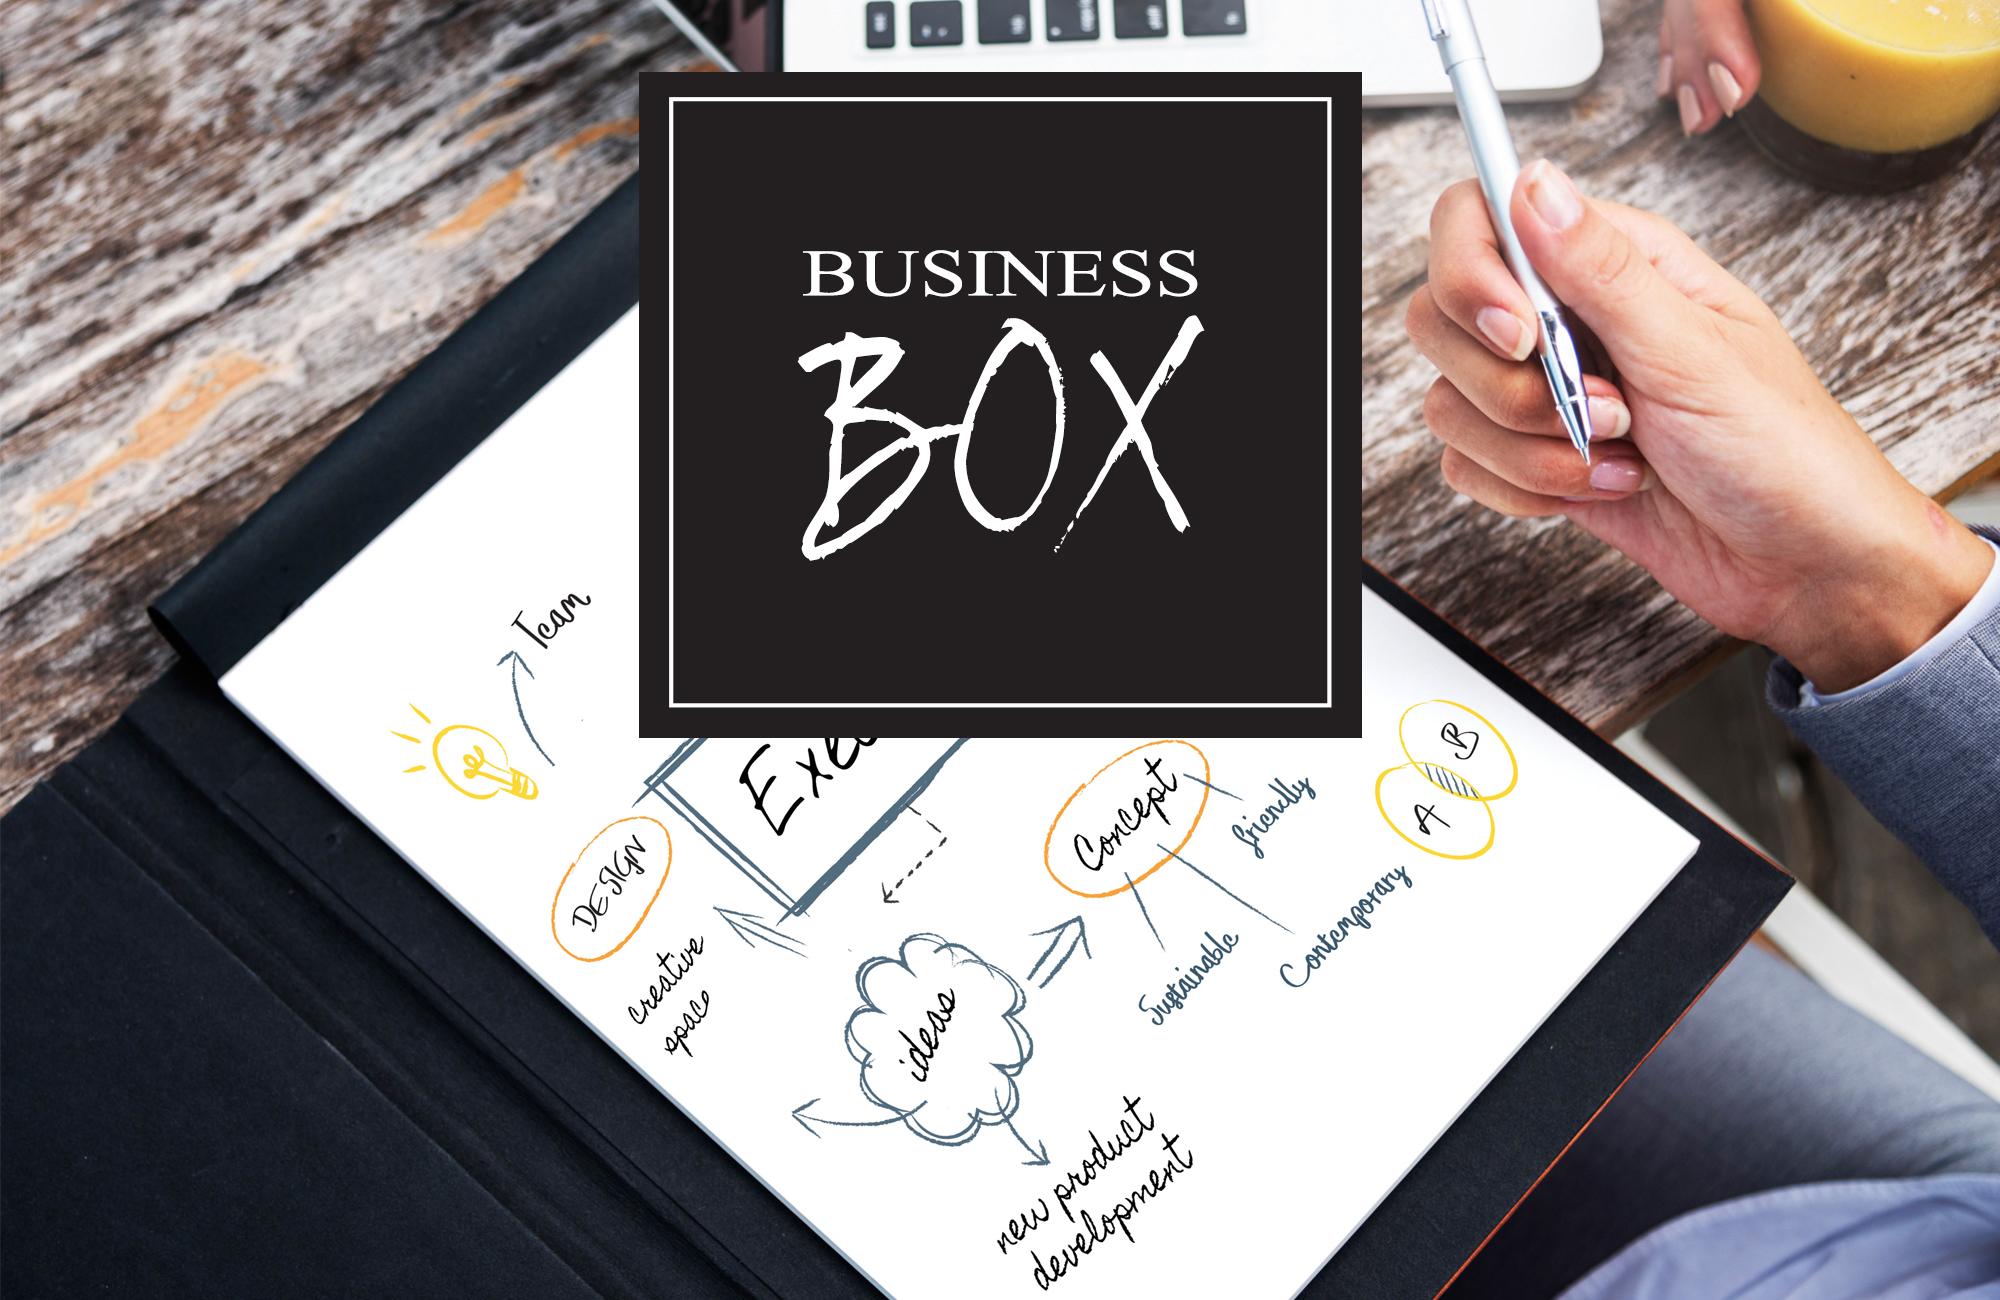 business box ad.jpg